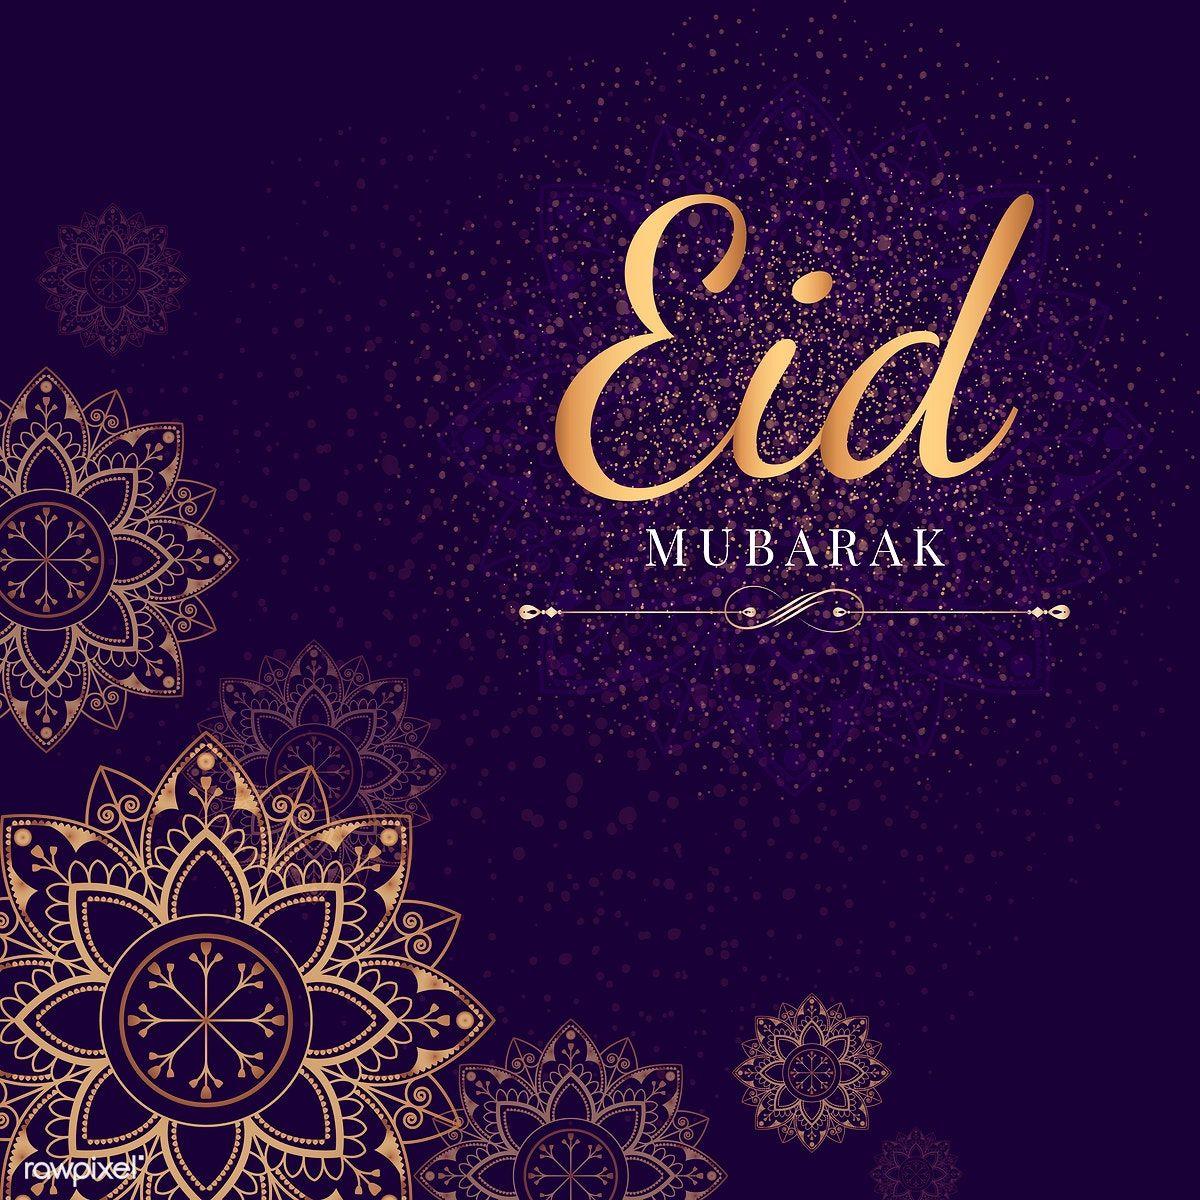 Download Premium Illustration Of Eid Mubarak Card With Mandala